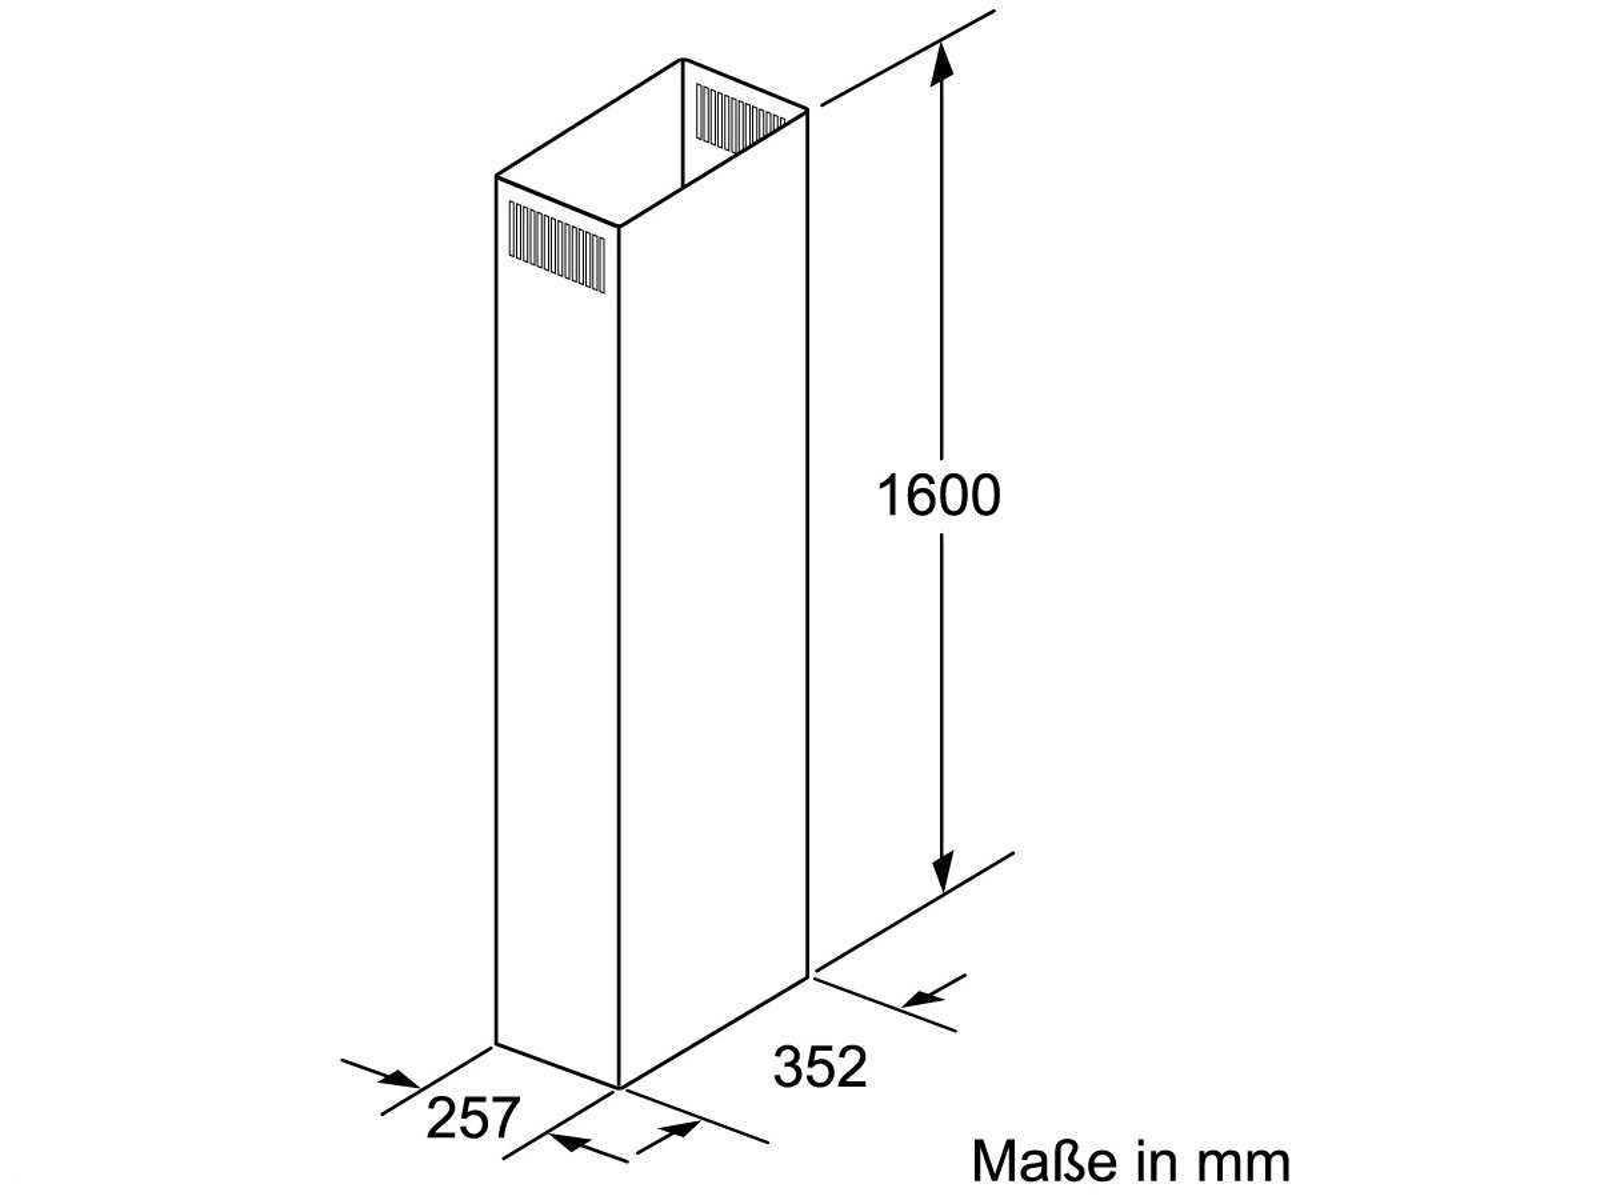 Siemens LZ12385 Kaminverlängerung 1600 mm